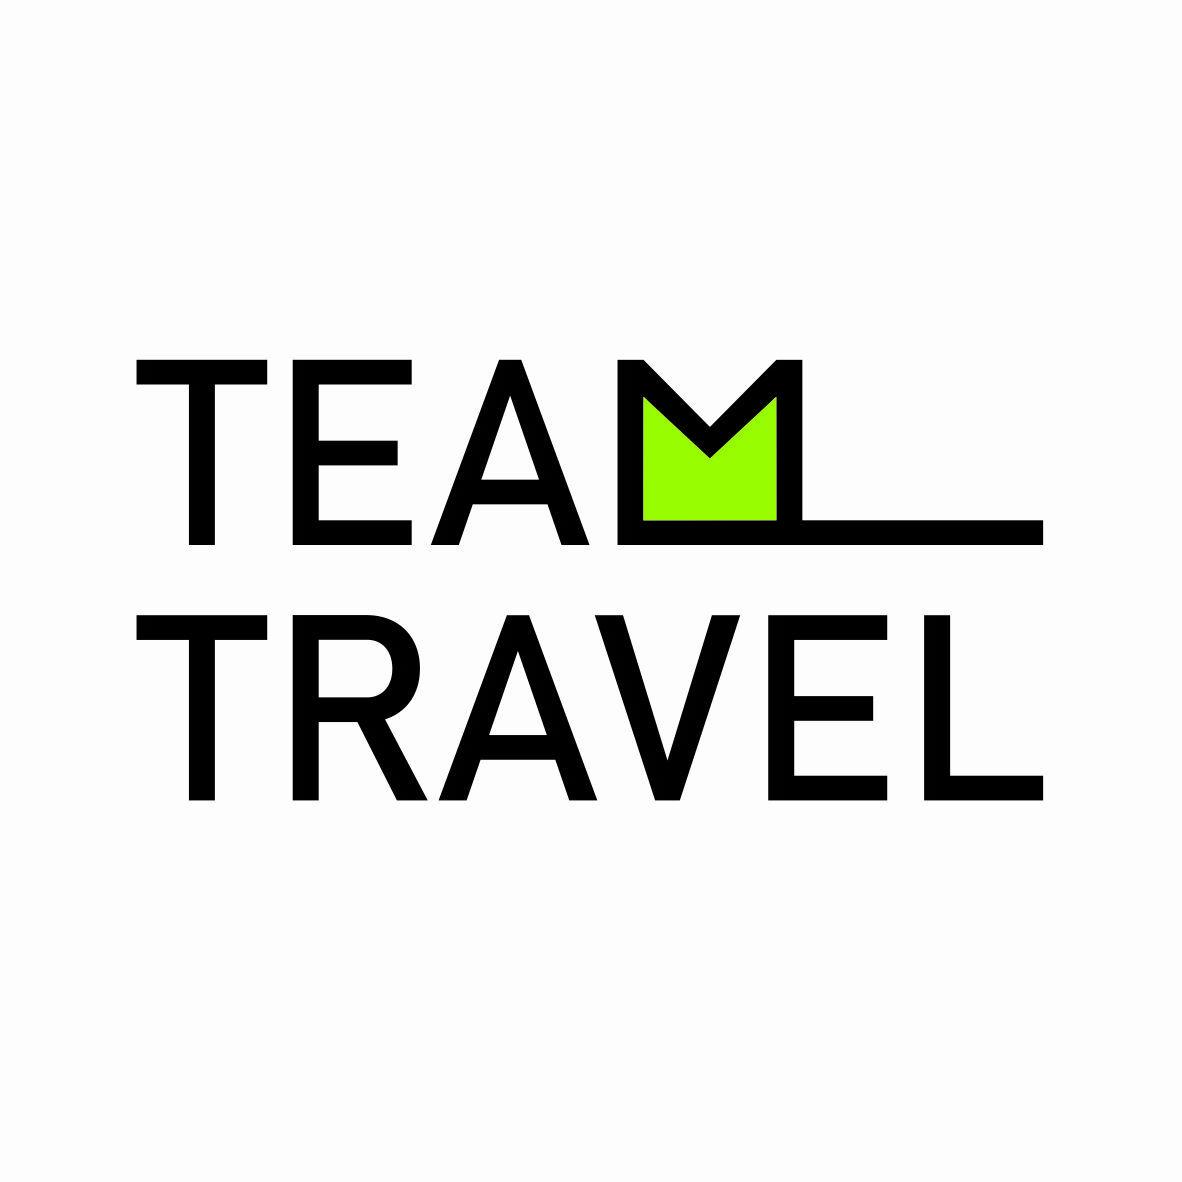 Teamtravel